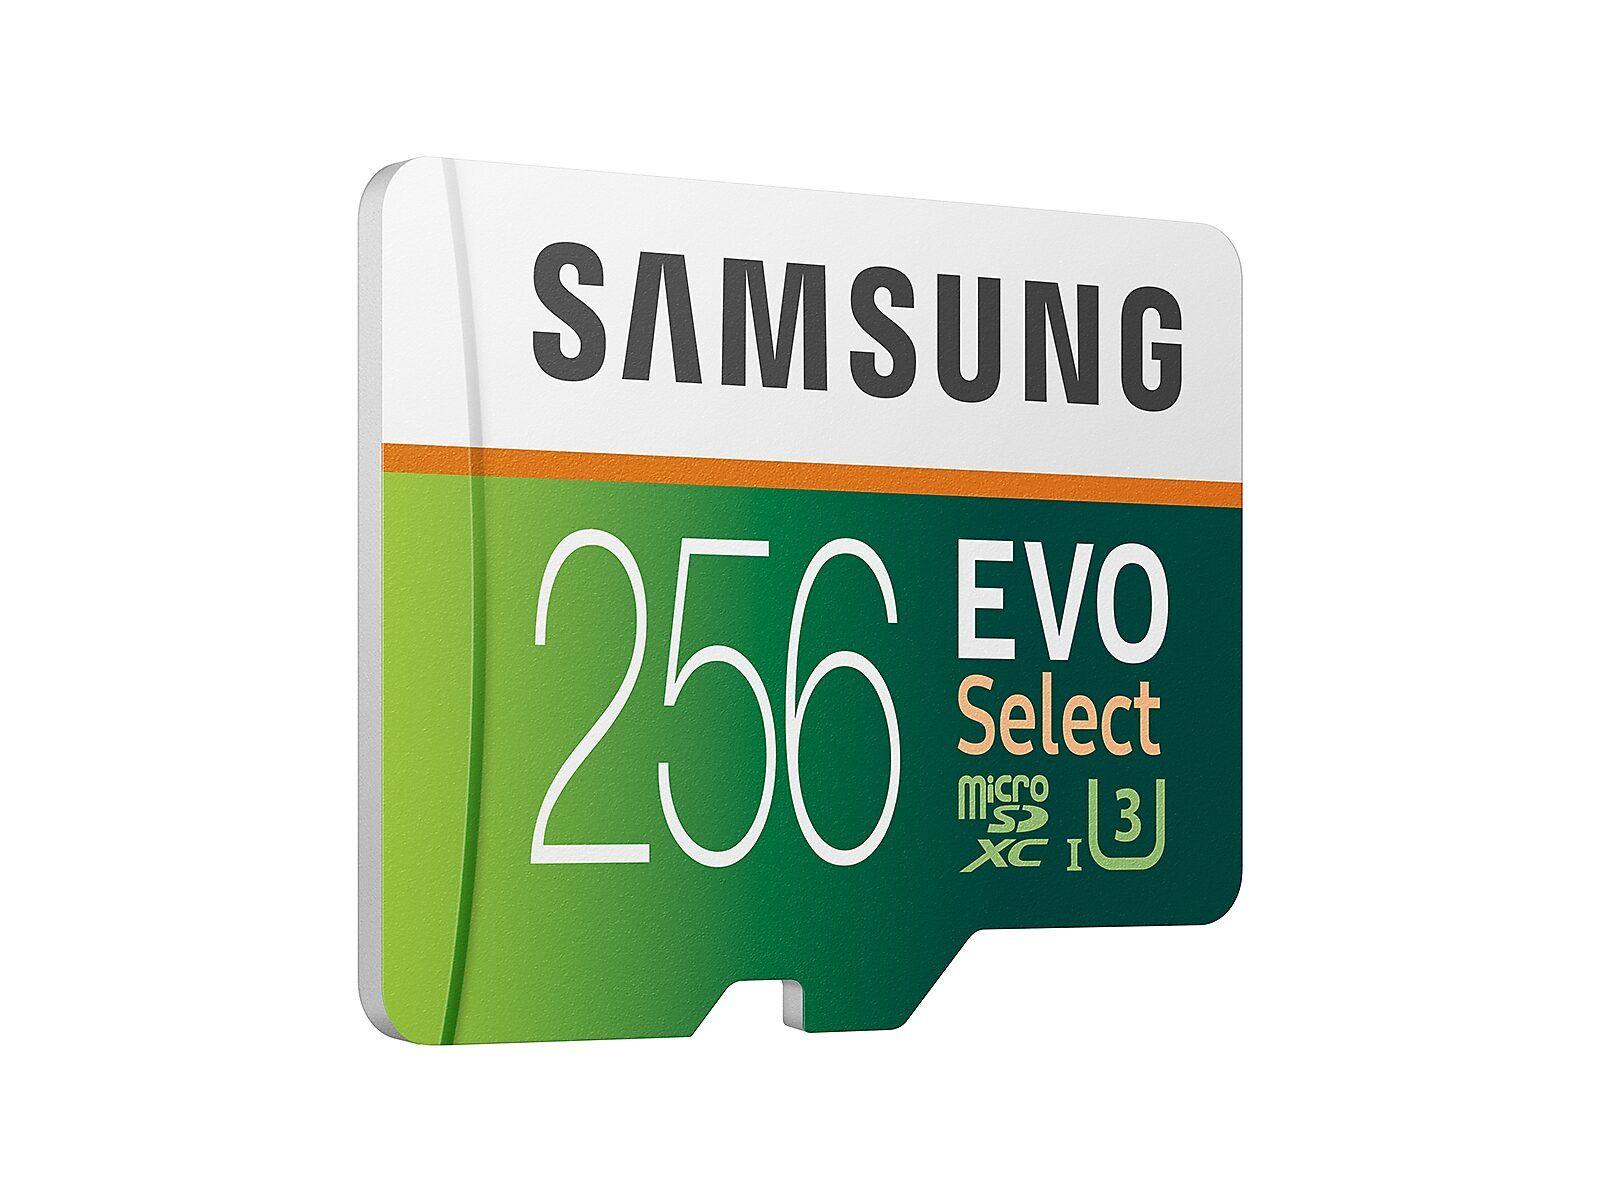 Evo Select Microsdxc Memory Card 256gb Memory Storage Mb Me256ha Am Samsung Us In 2021 Memory Cards Memory Storage Samsung